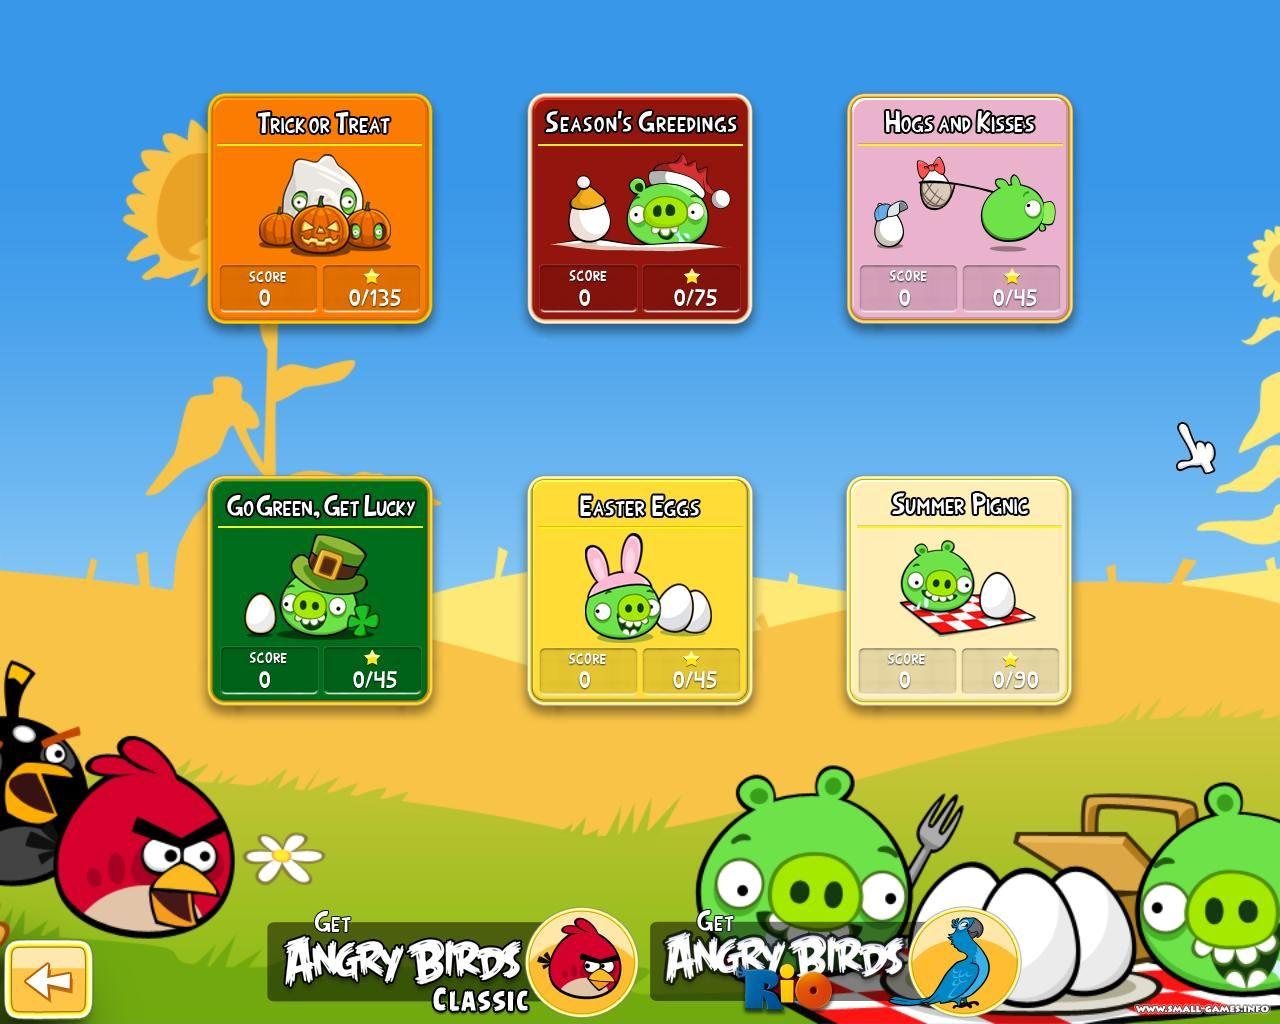 Angry Birds Seasons for PC v4.0.1 / +UKR